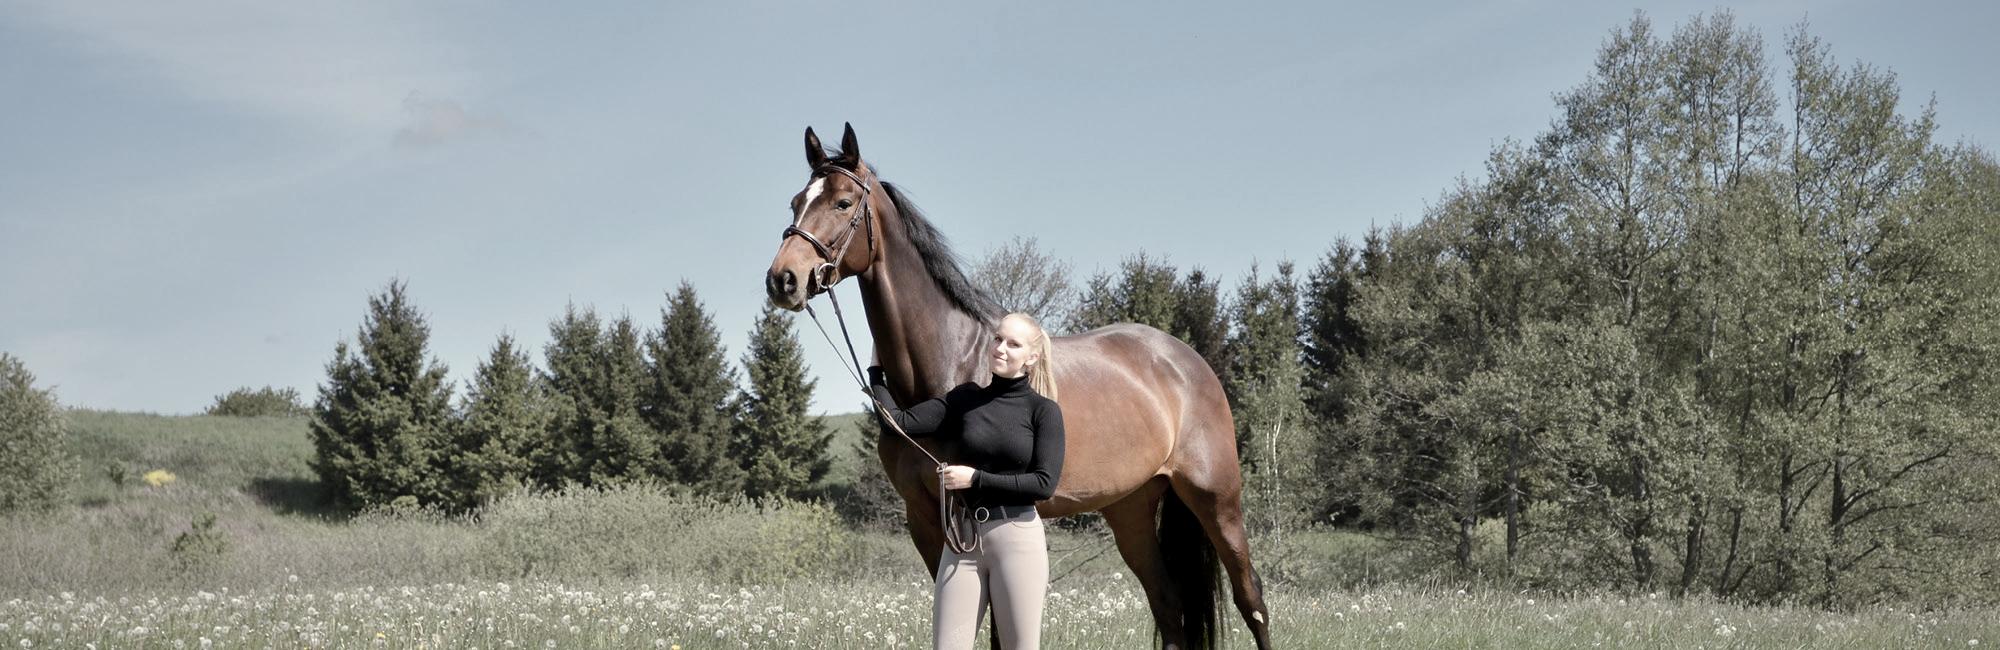 Little Equestrian